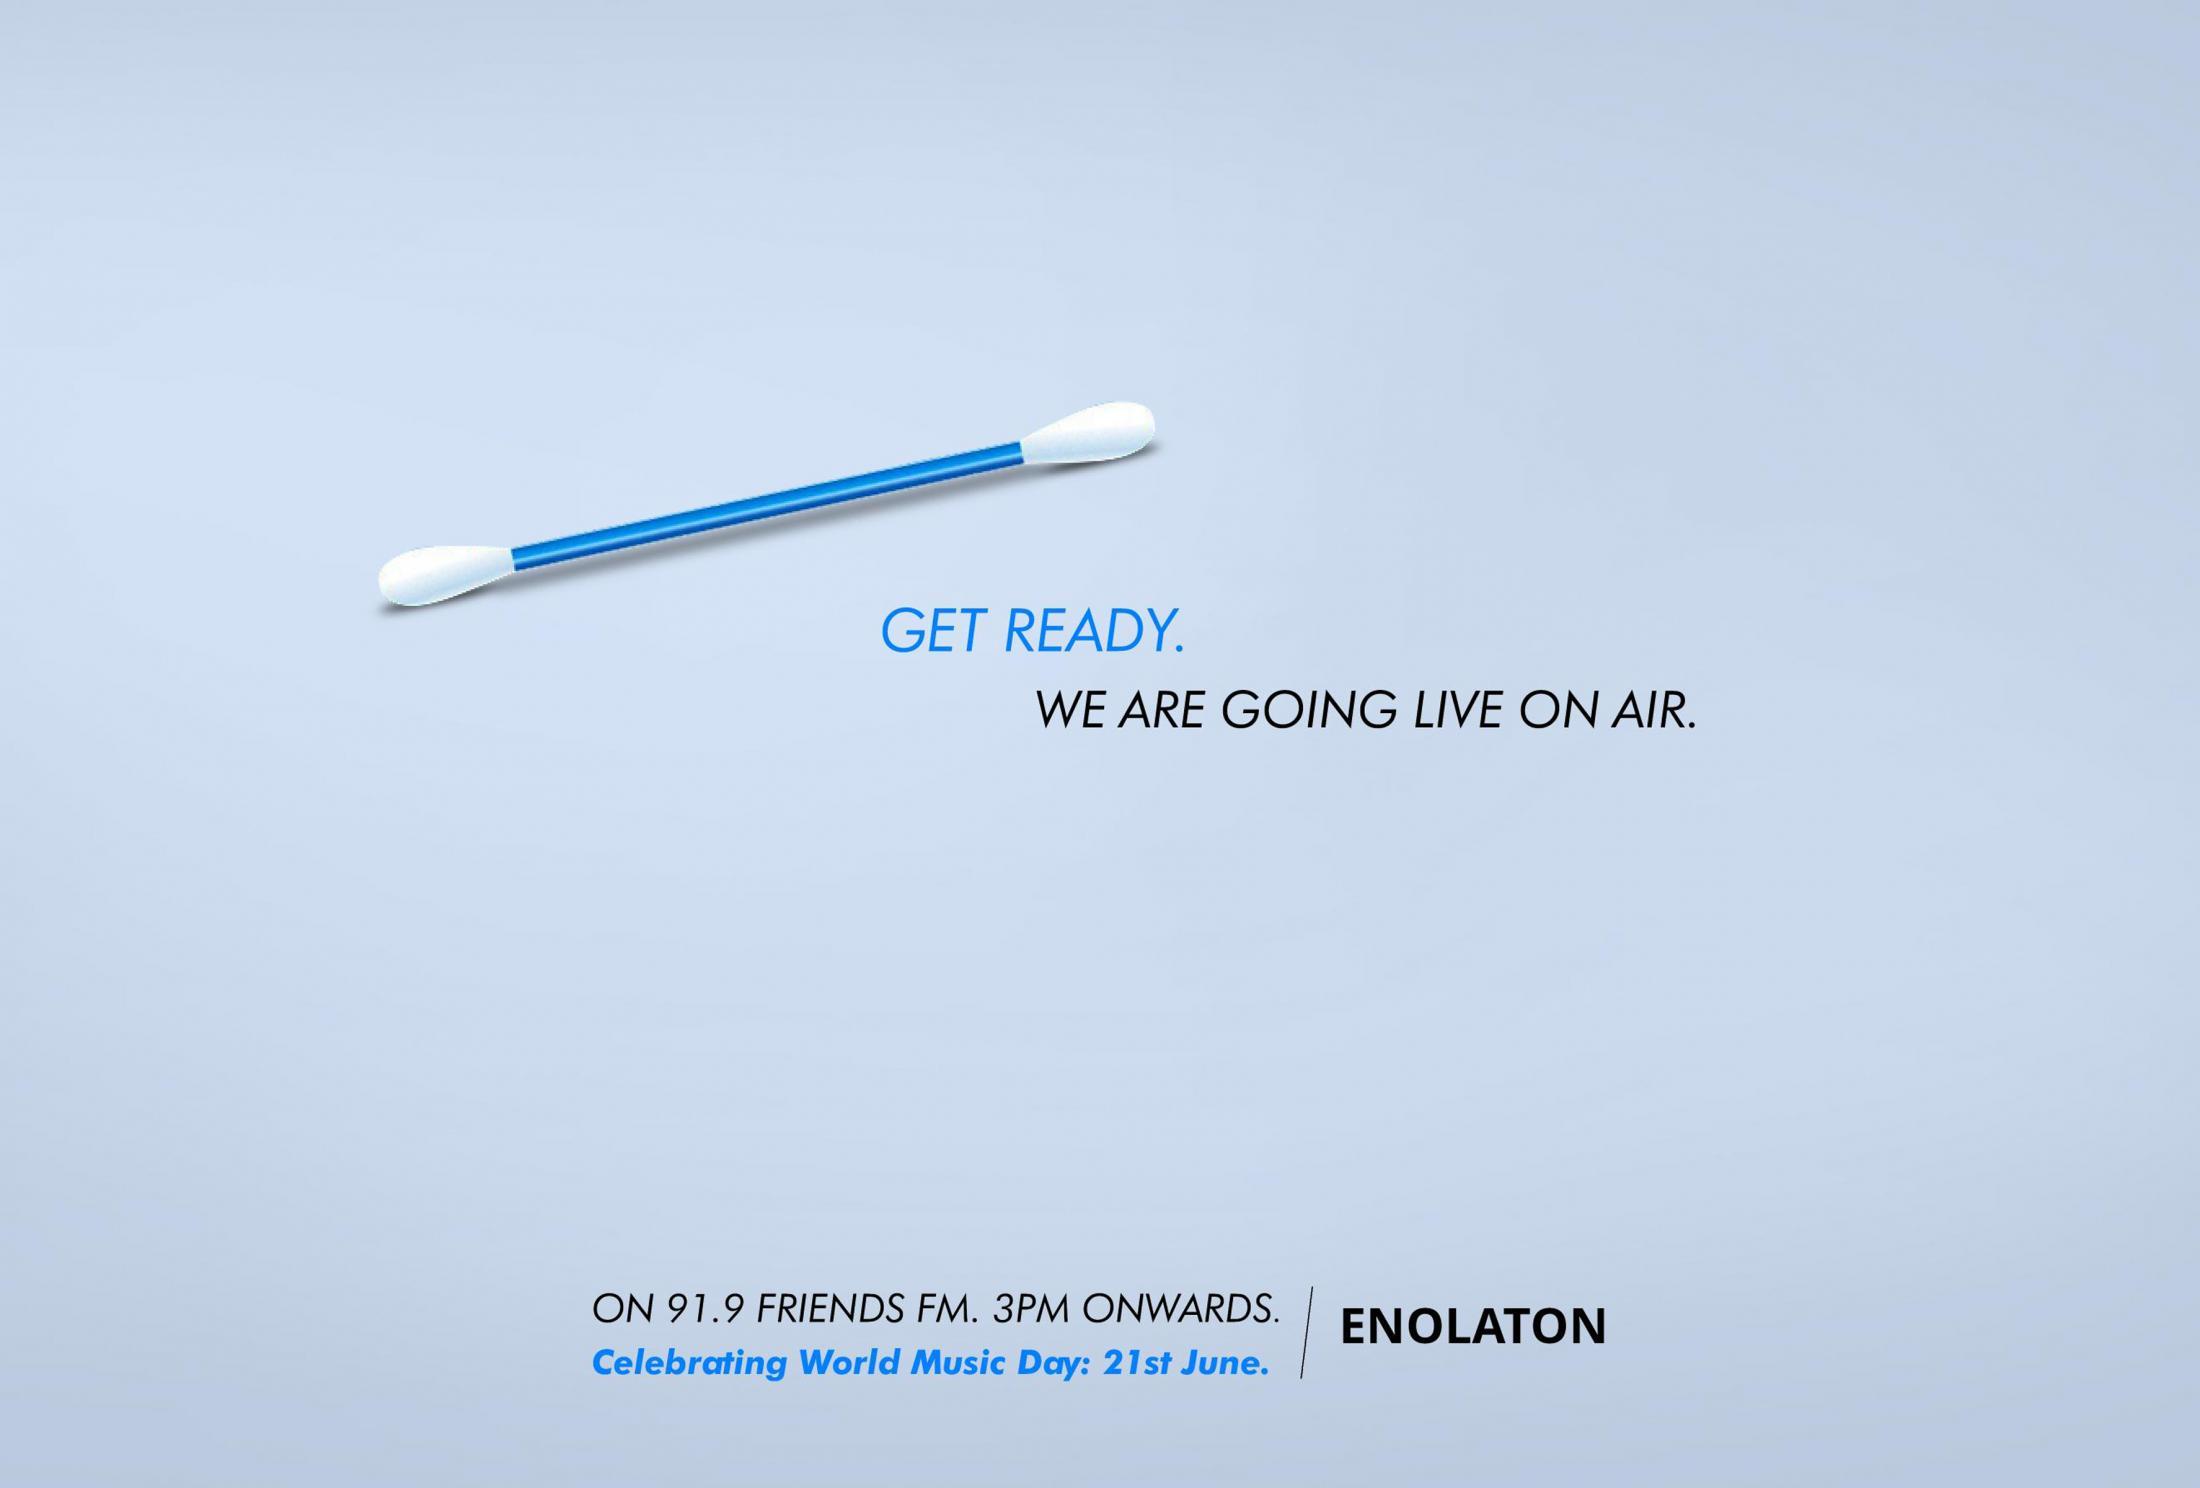 Enolaton Digital Ad - World Music Day